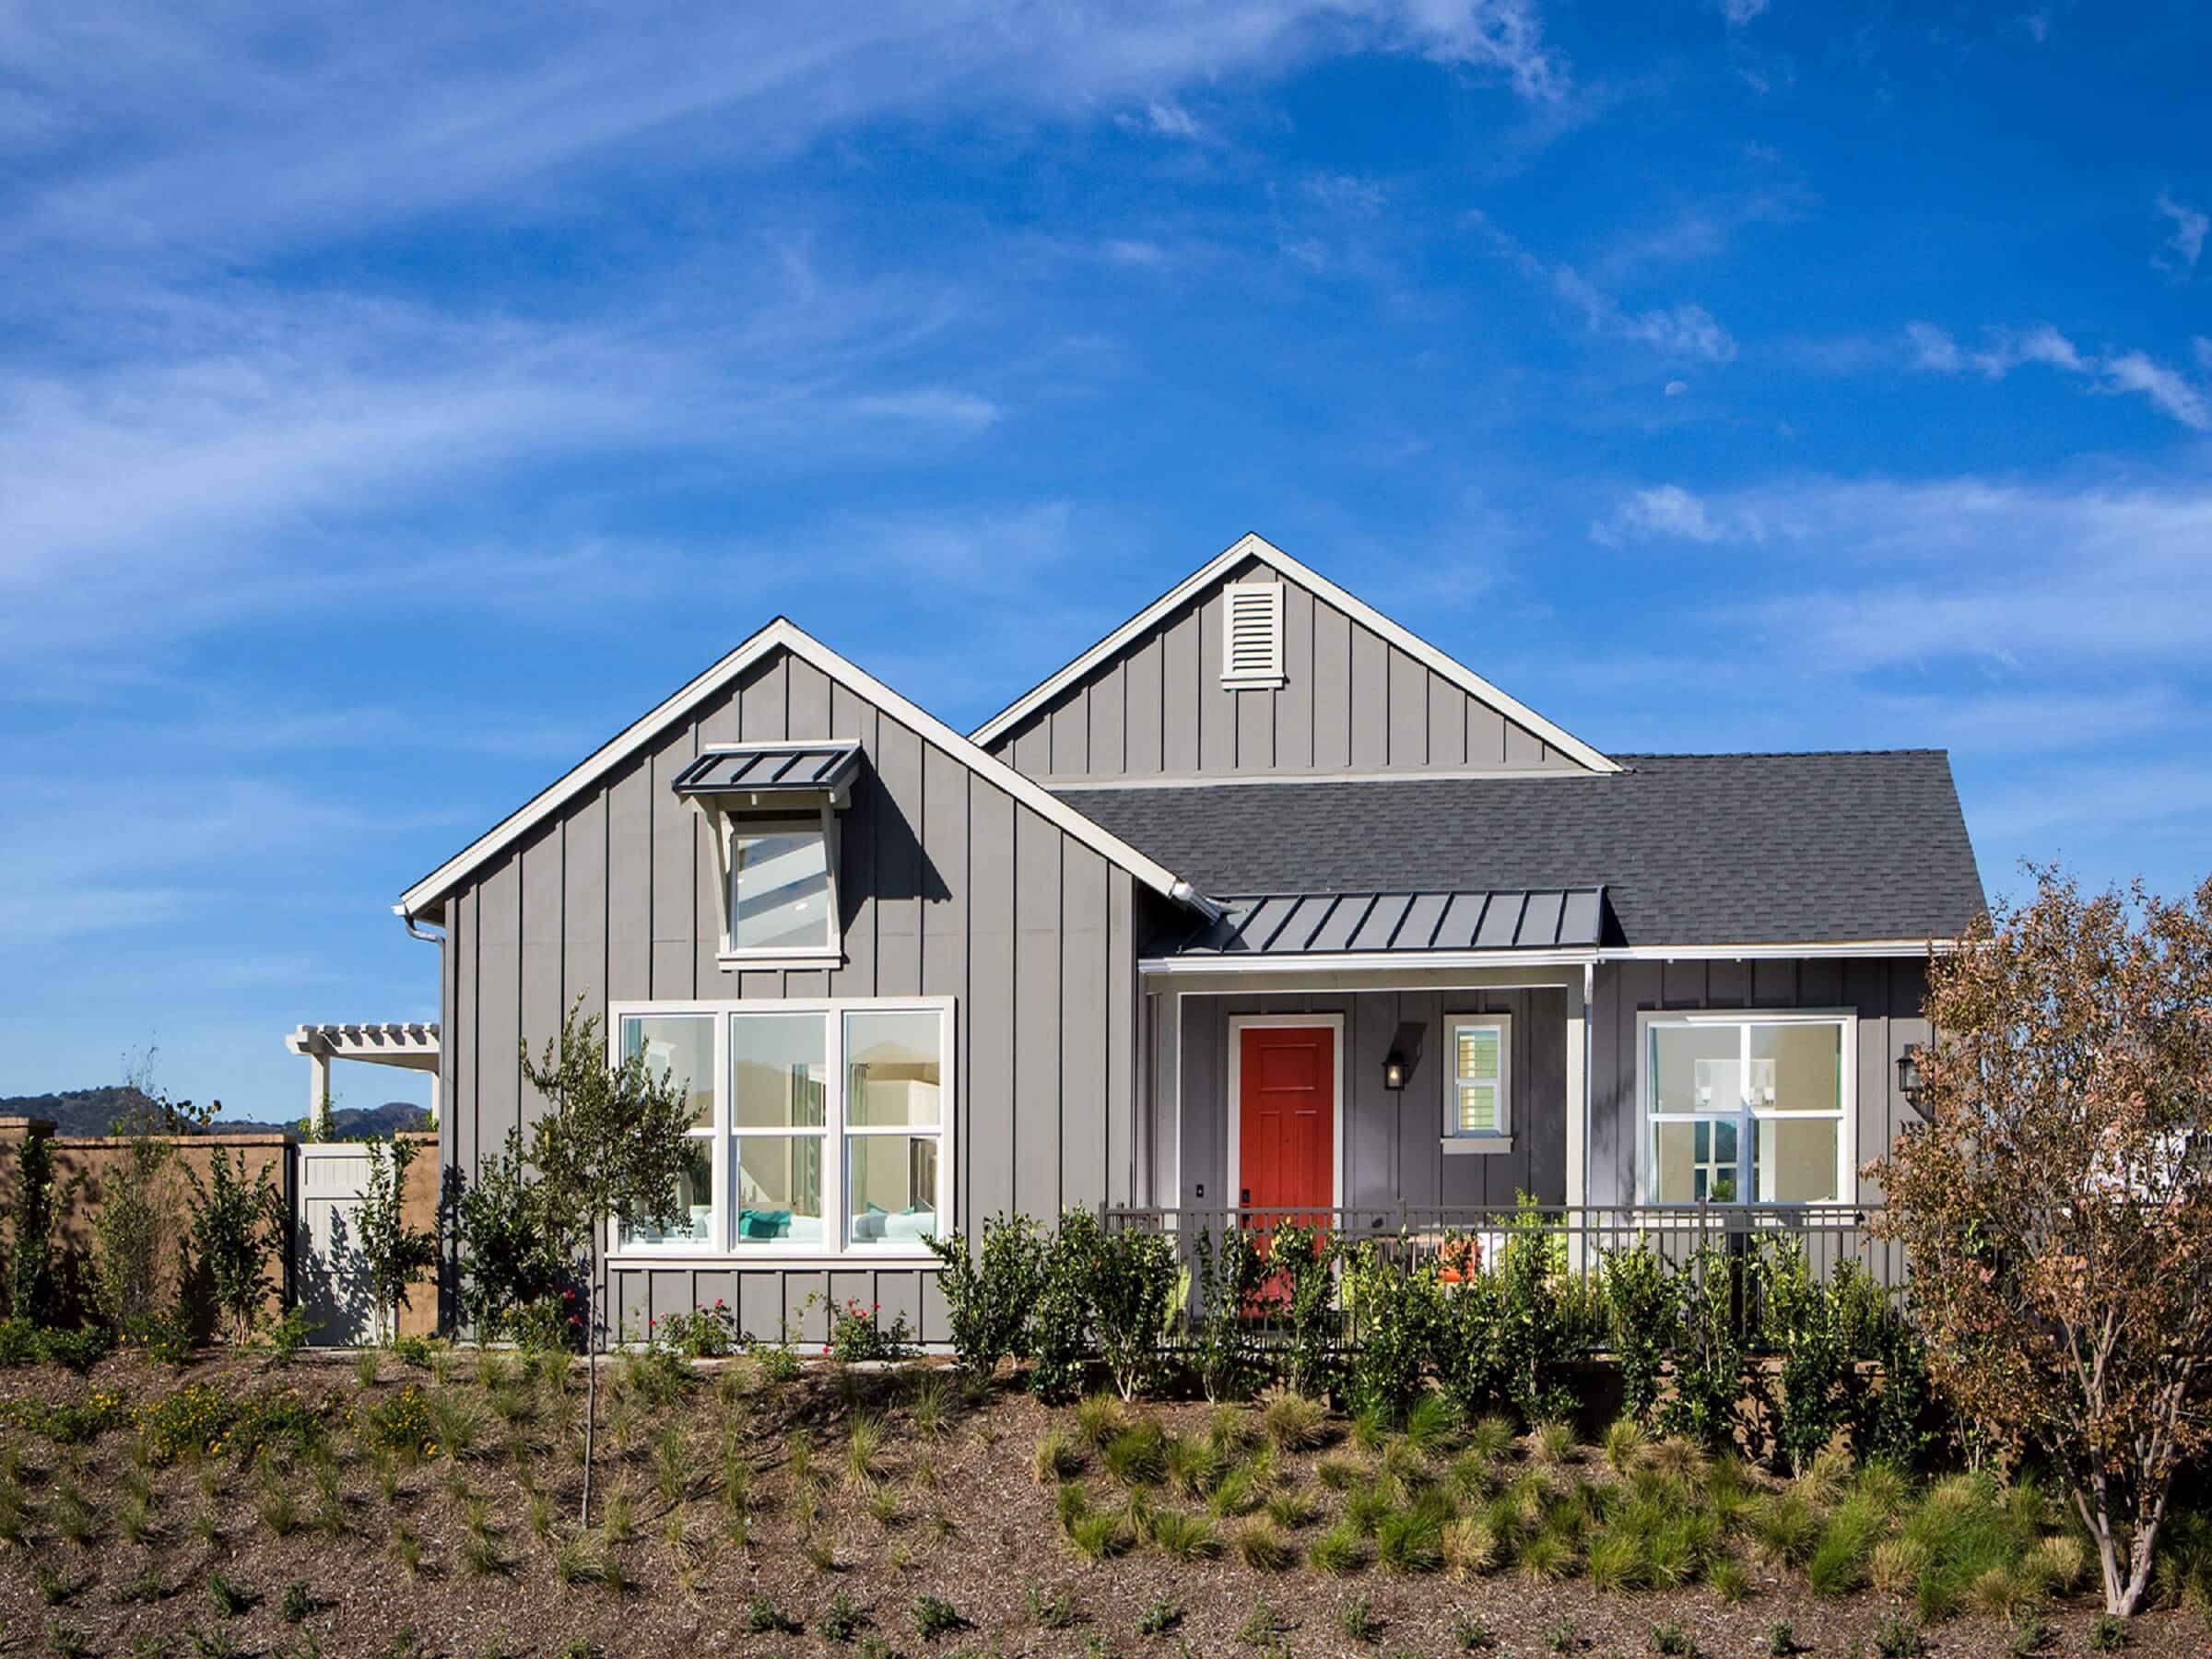 'Single Family' building or community at 'Vireo at Esencia Ladera Ranch, California 92694 United States'